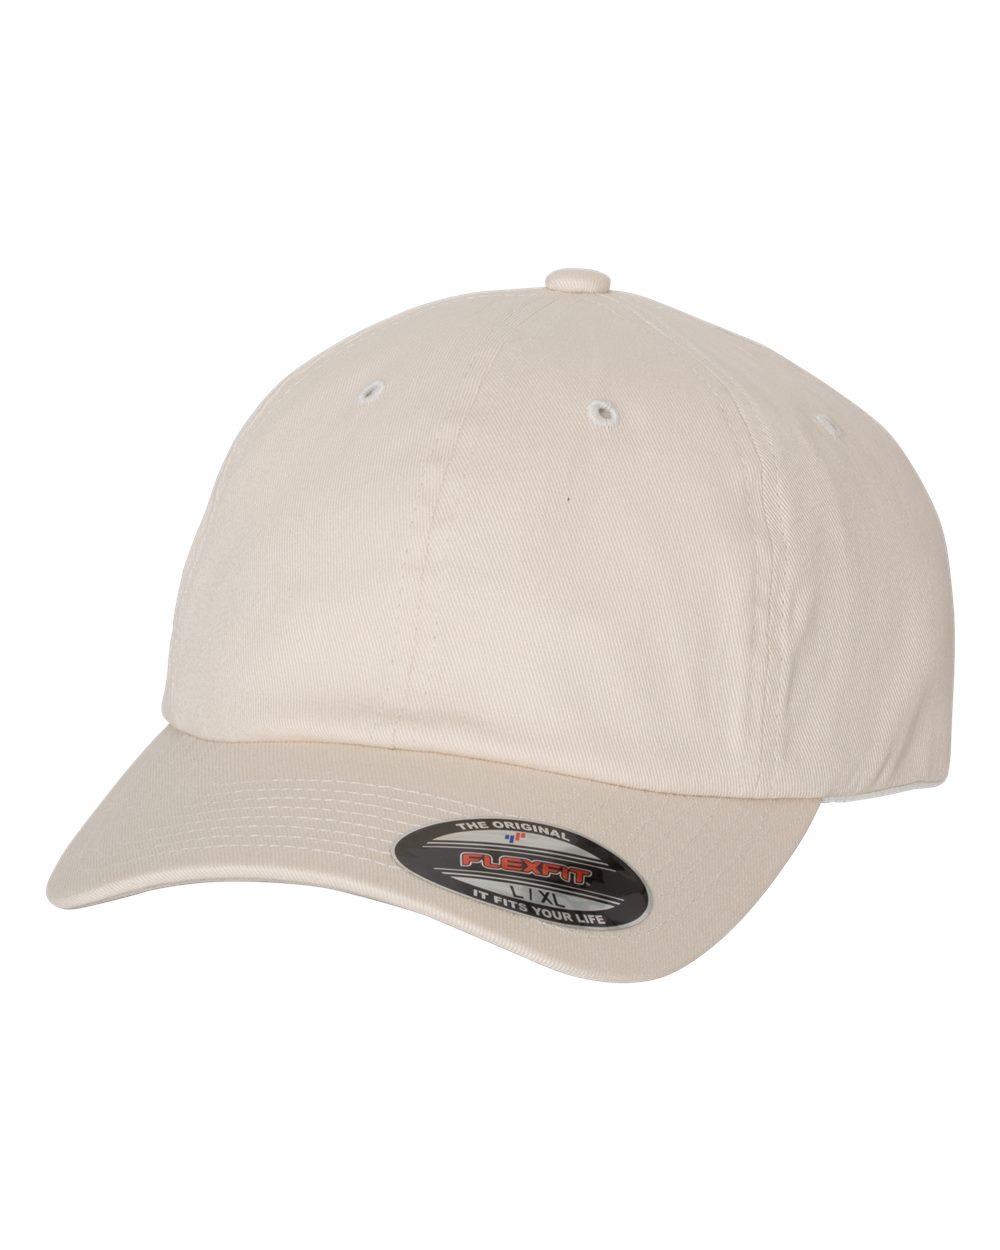 Flexfit 6745 - Cotton Twill Dad's Cap